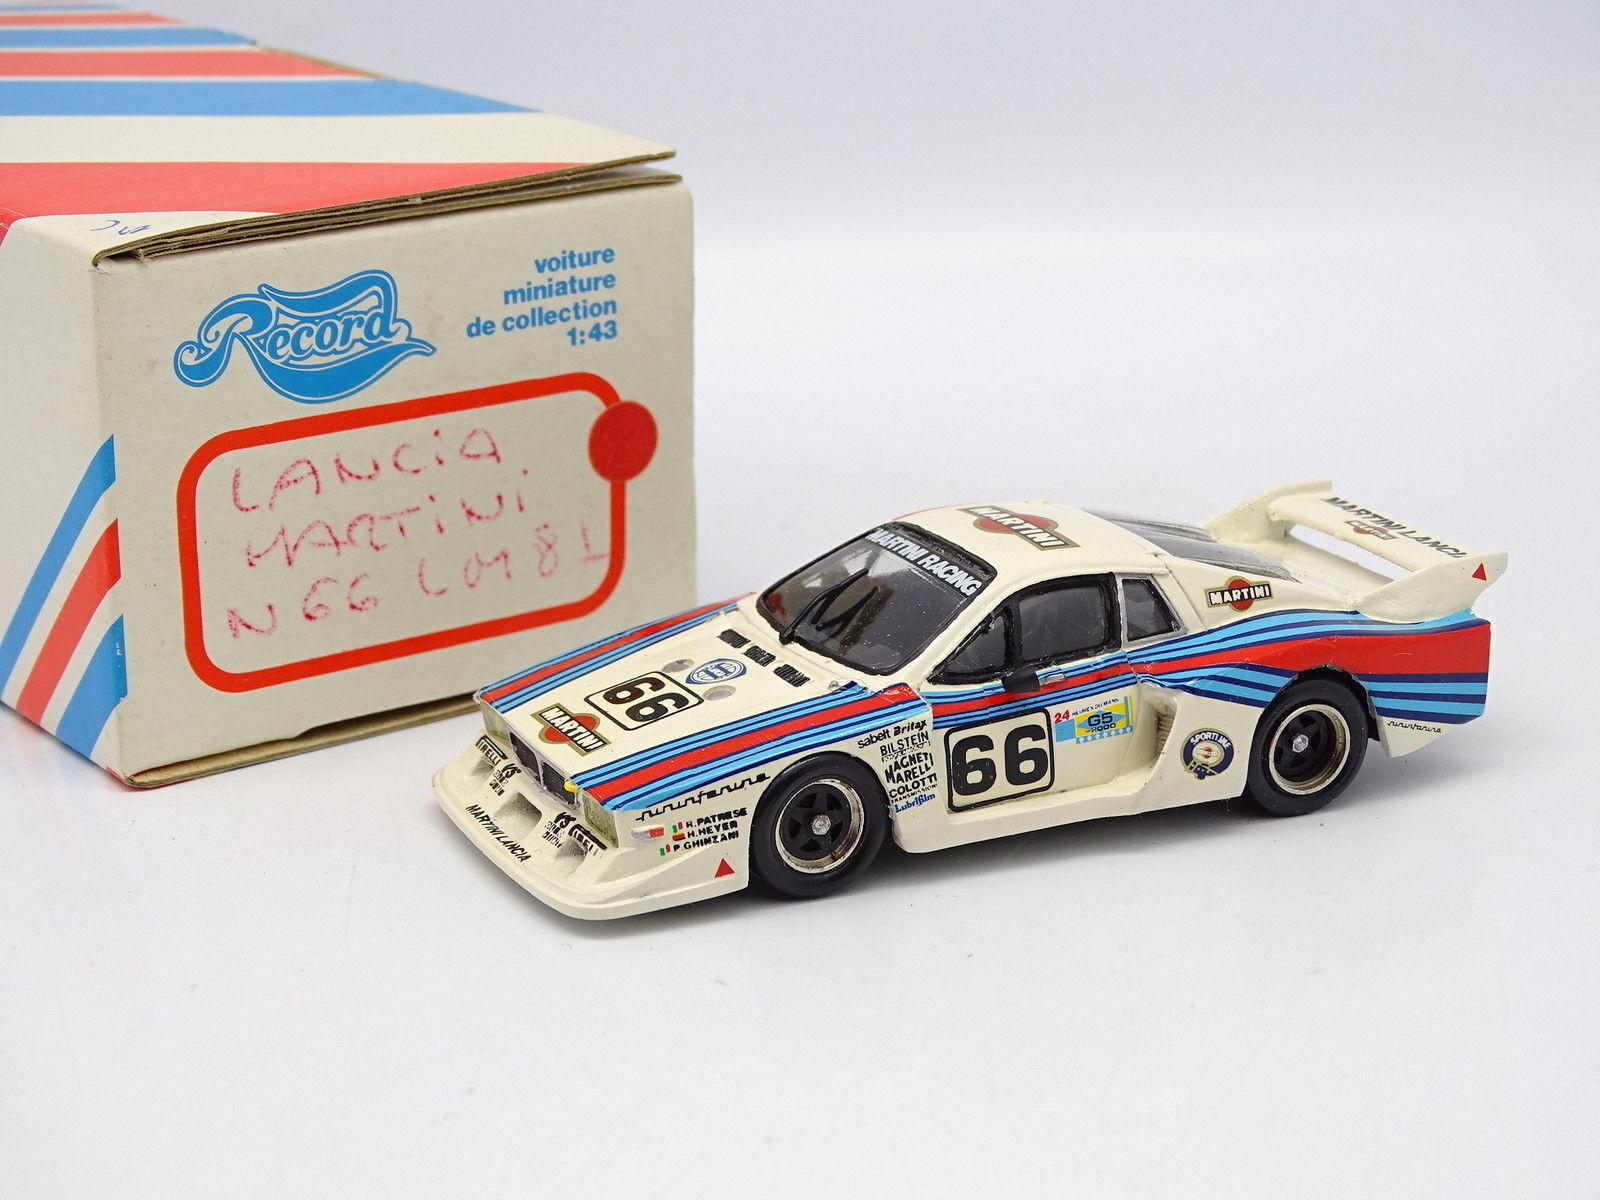 Record Kit Montado Resina 1 43 - Lancia Beta Martini Le Mans 1981 Nº66